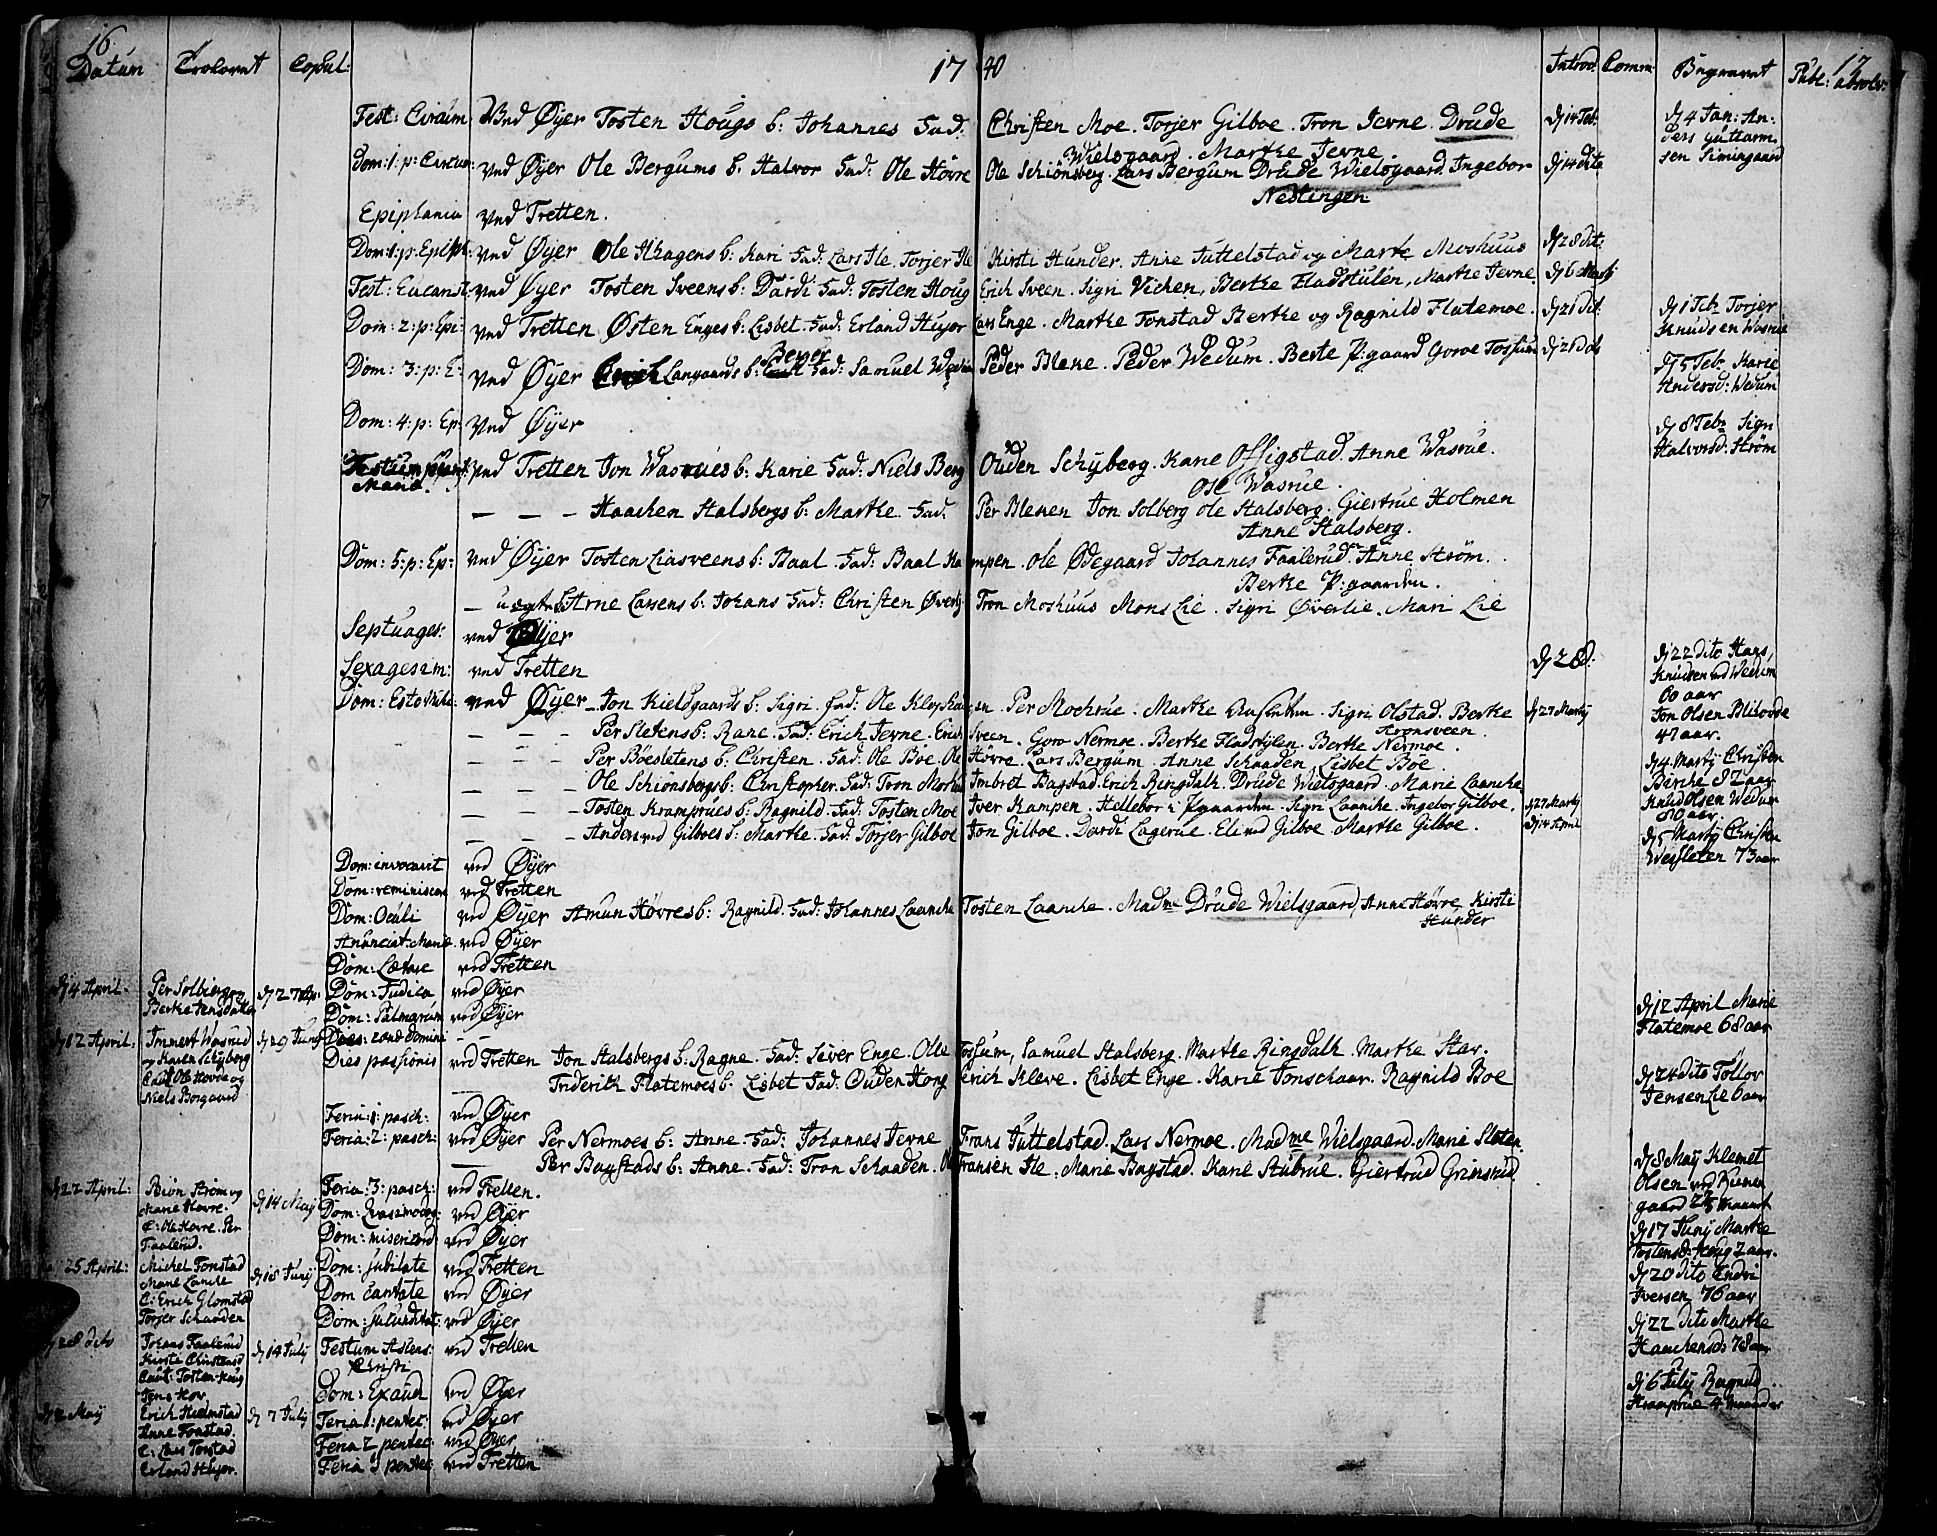 SAH, Øyer prestekontor, Ministerialbok nr. 2, 1733-1784, s. 16-17